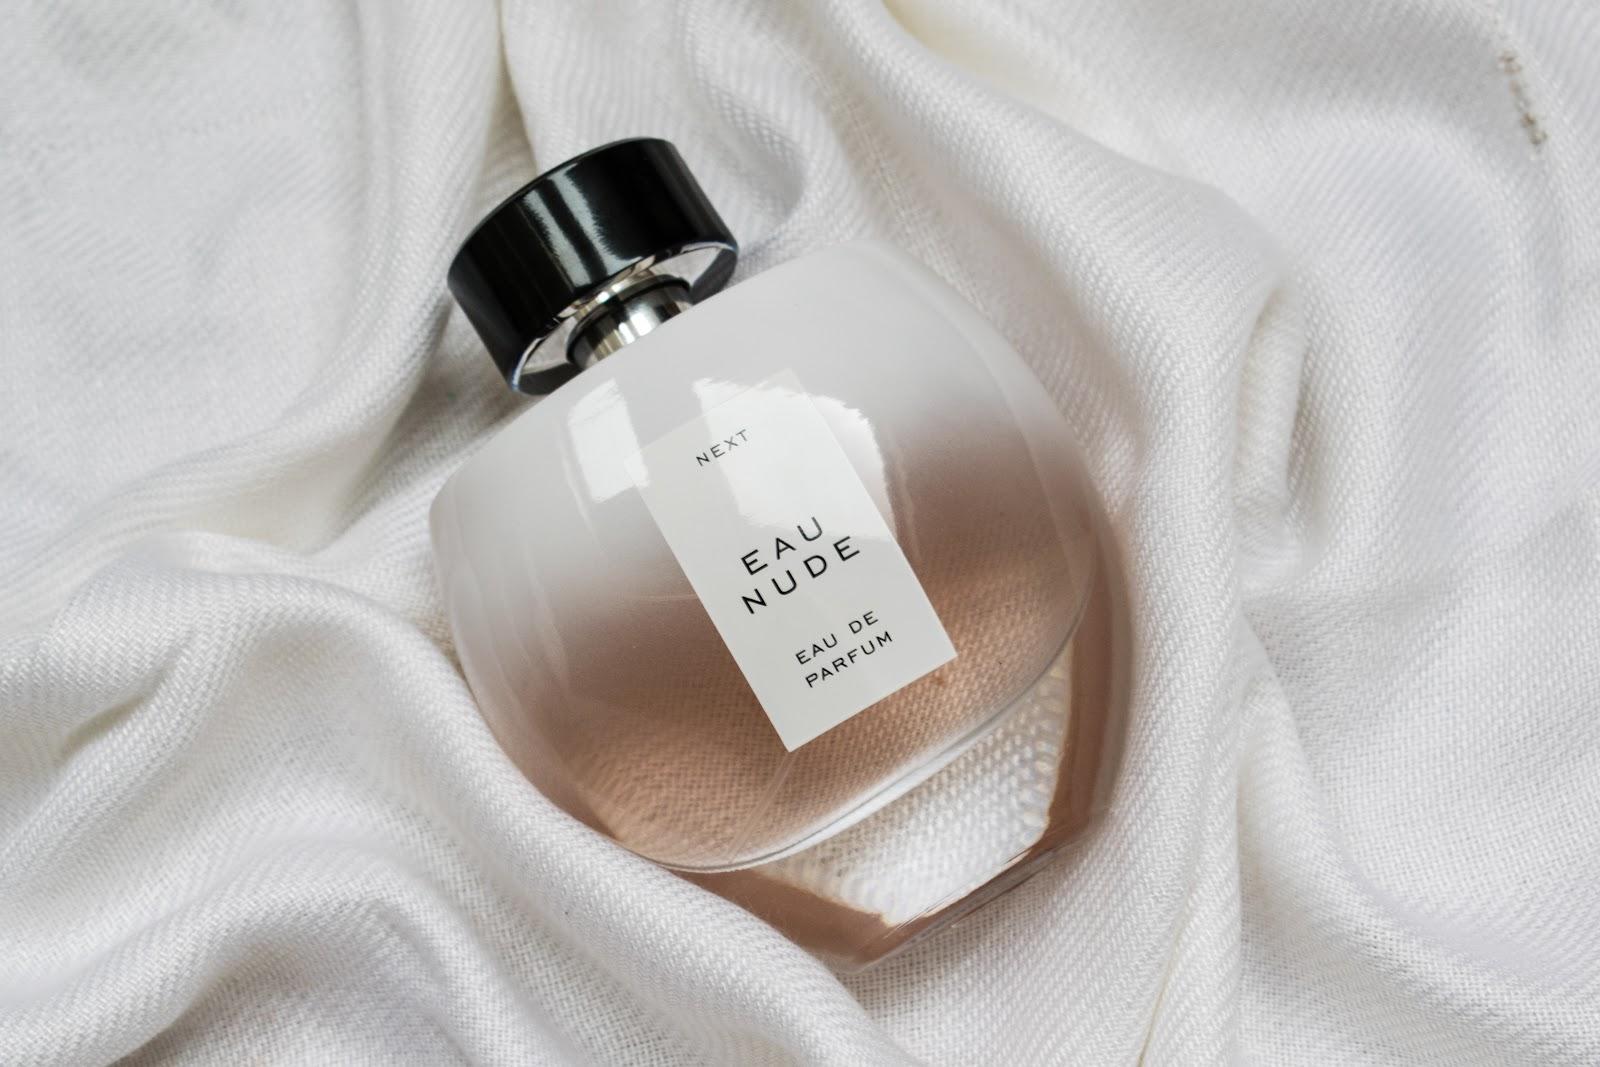 NEXT Eau Nude Perfume Chanel Mademoiselle Dupe